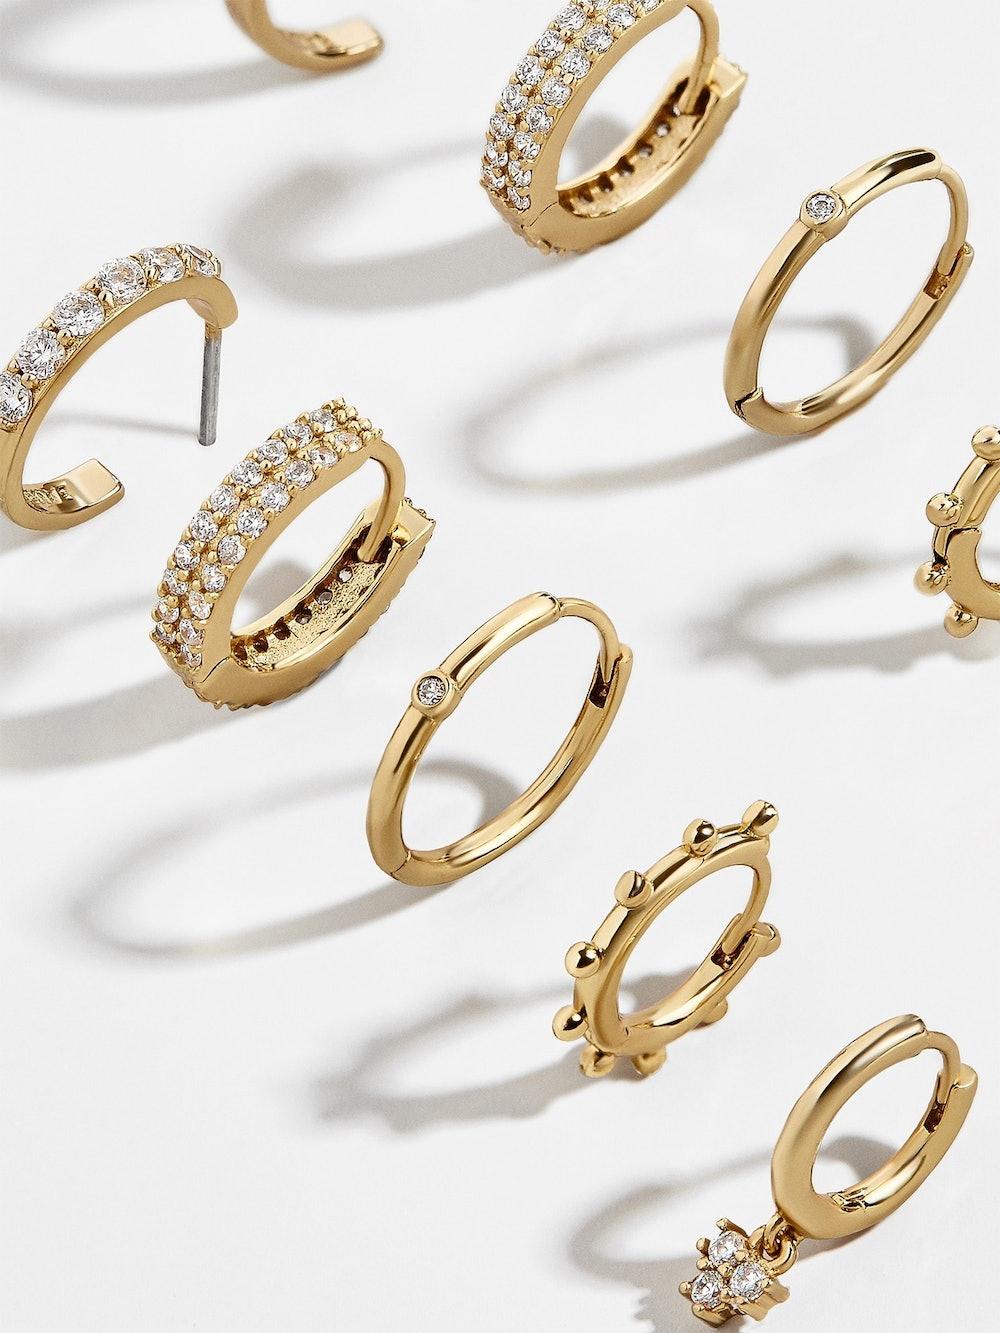 Liza Gold Huggie Hoop Earring Kit